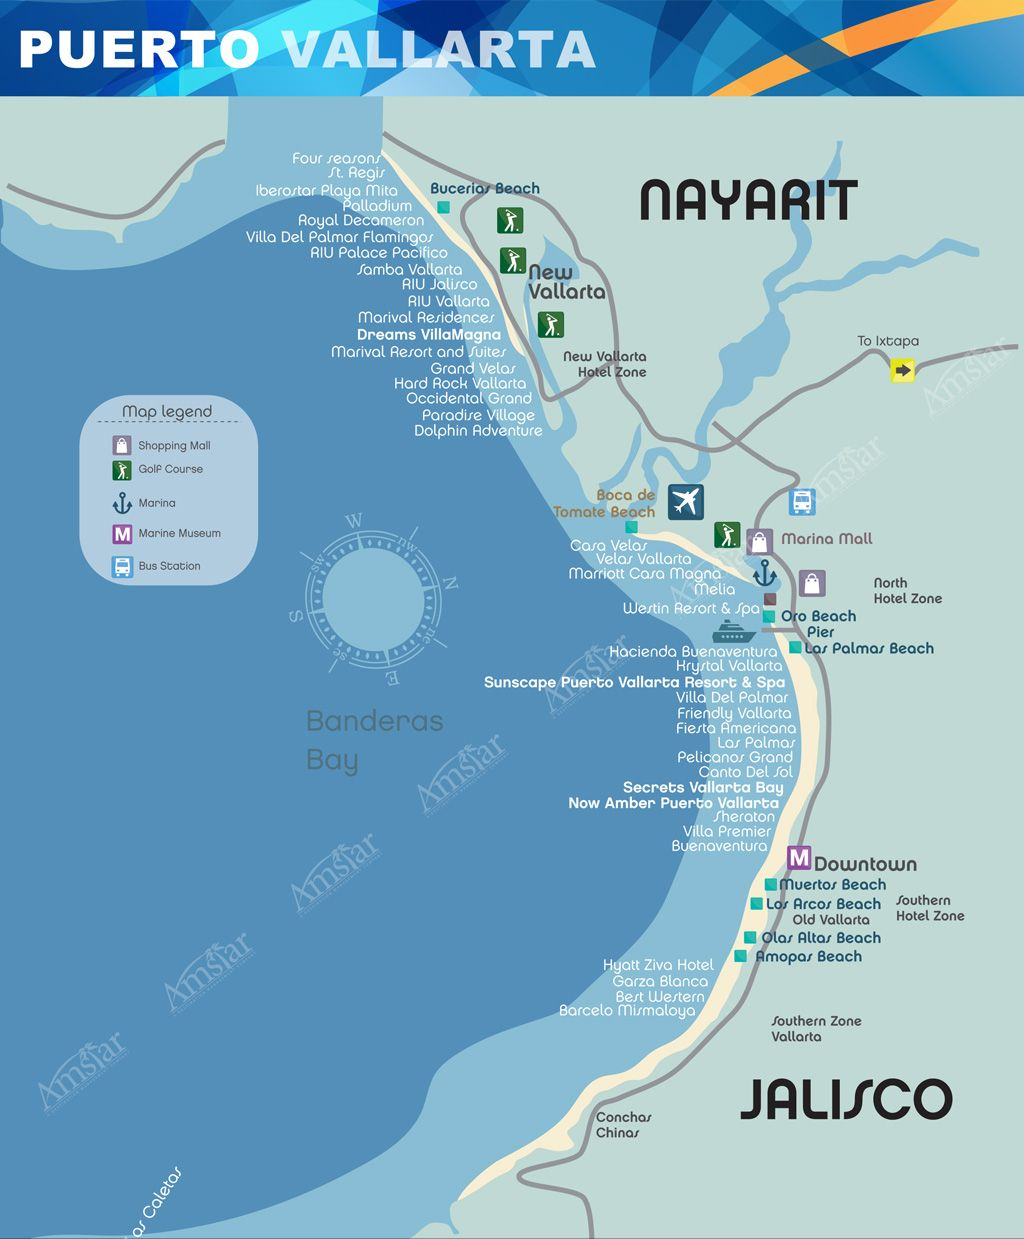 Puerto Vallarta Map Things To Do In Vallarta Puerto Vallarta